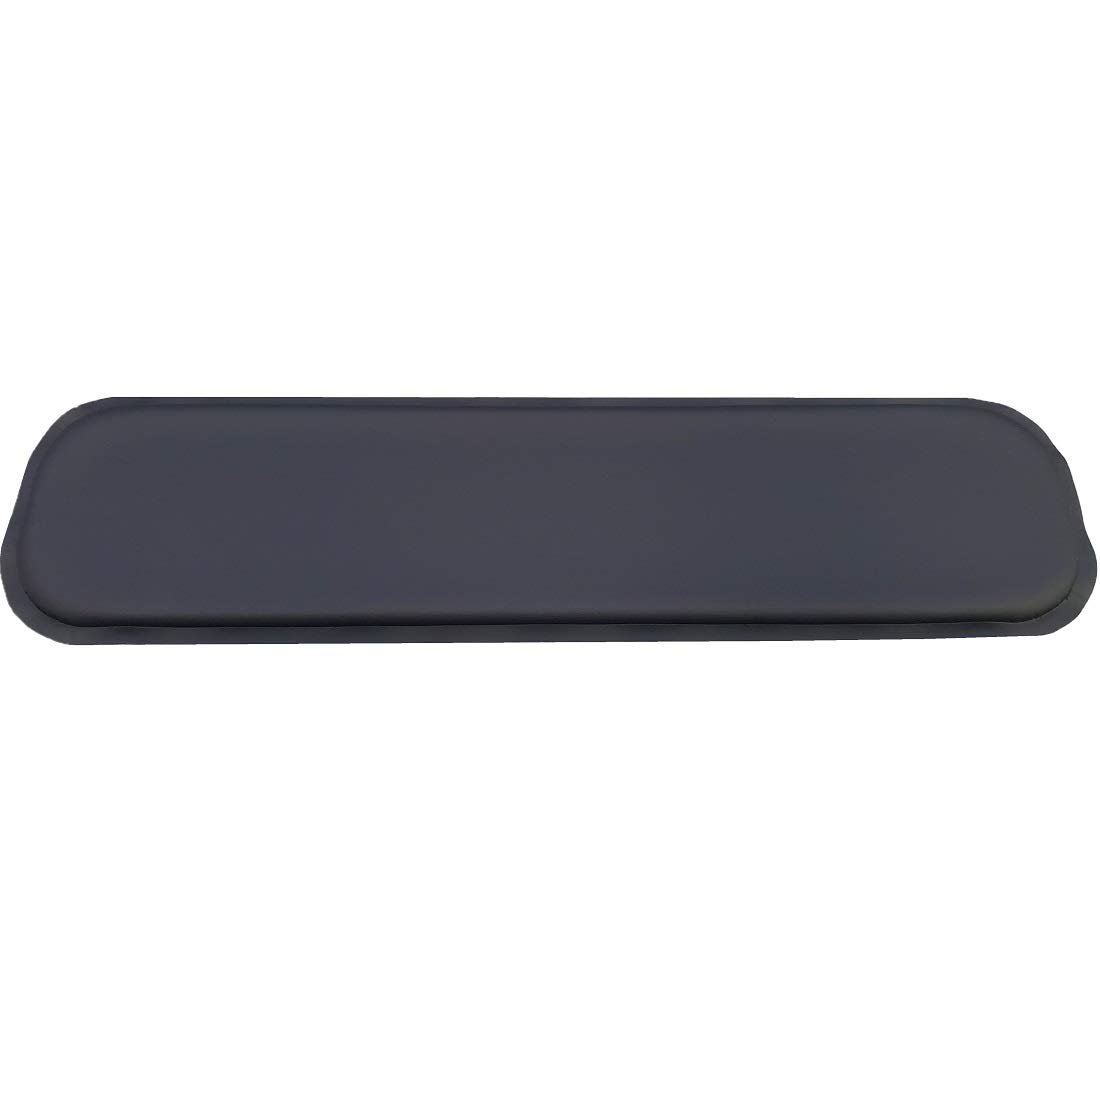 ULTRAGEL''Gaming'' Super Comfy Arm/Elbow/Wrist Rest Gel Pads (Full Key 4.5x17.5, Black)